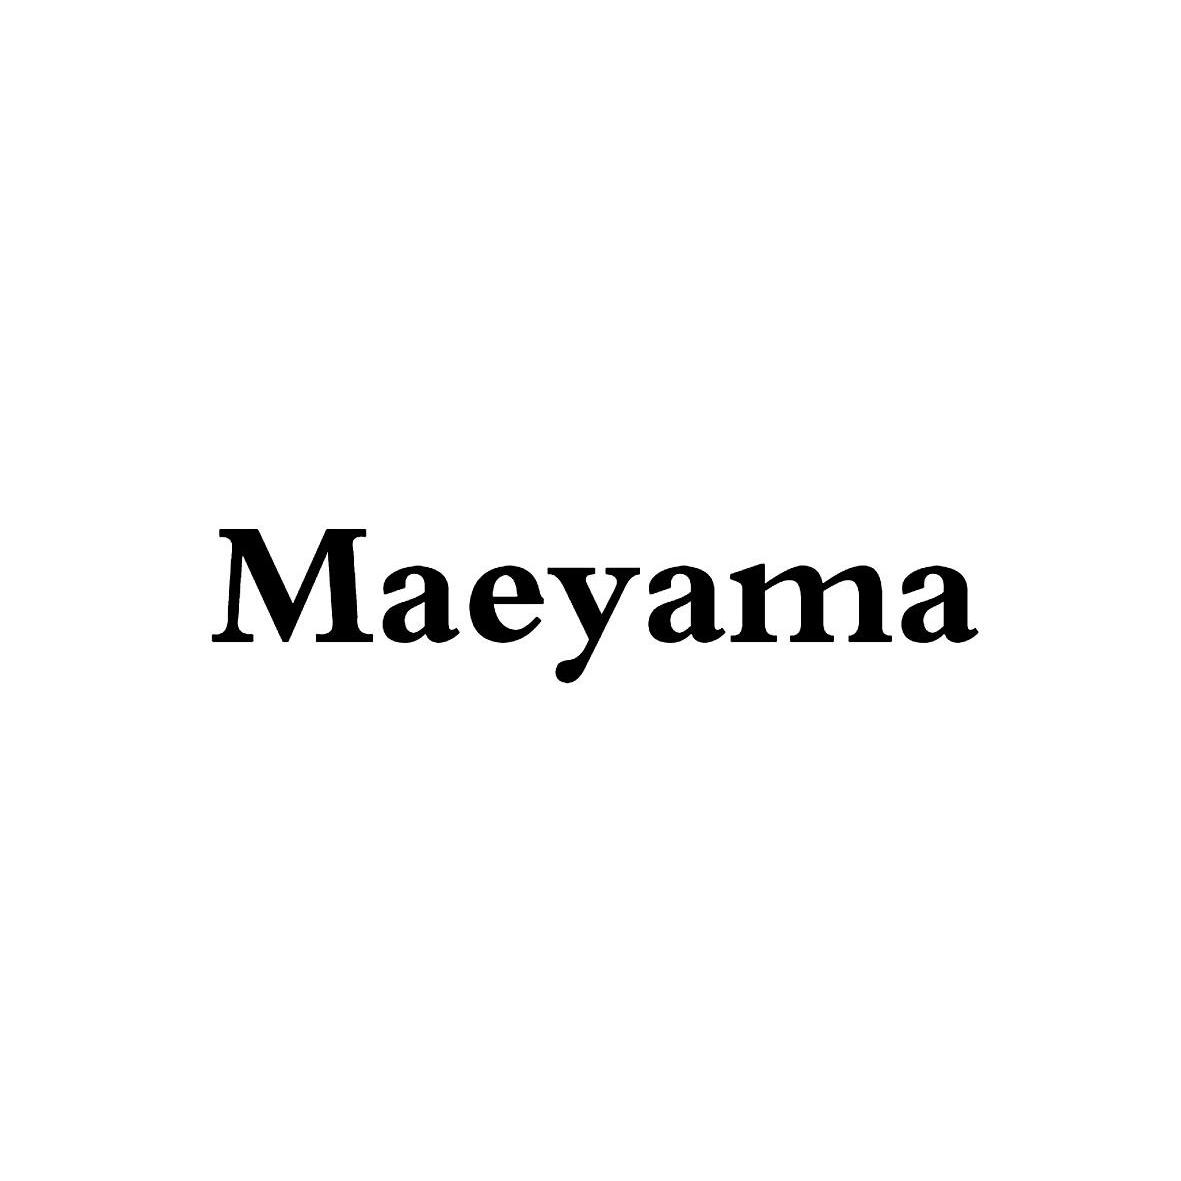 MAEYAMA